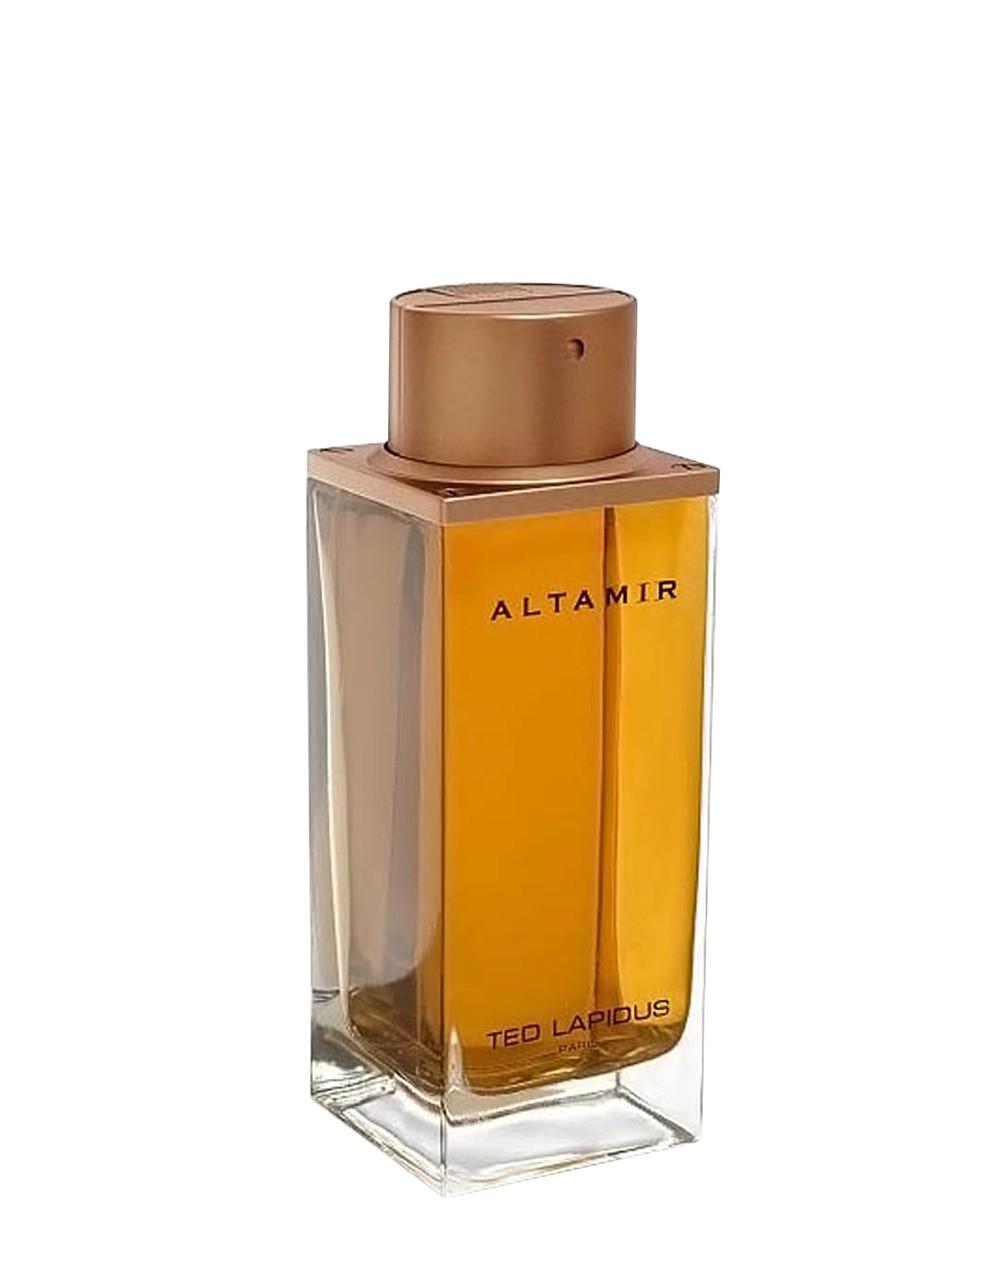 Ted Lapidus Altamir аромат для мужчин